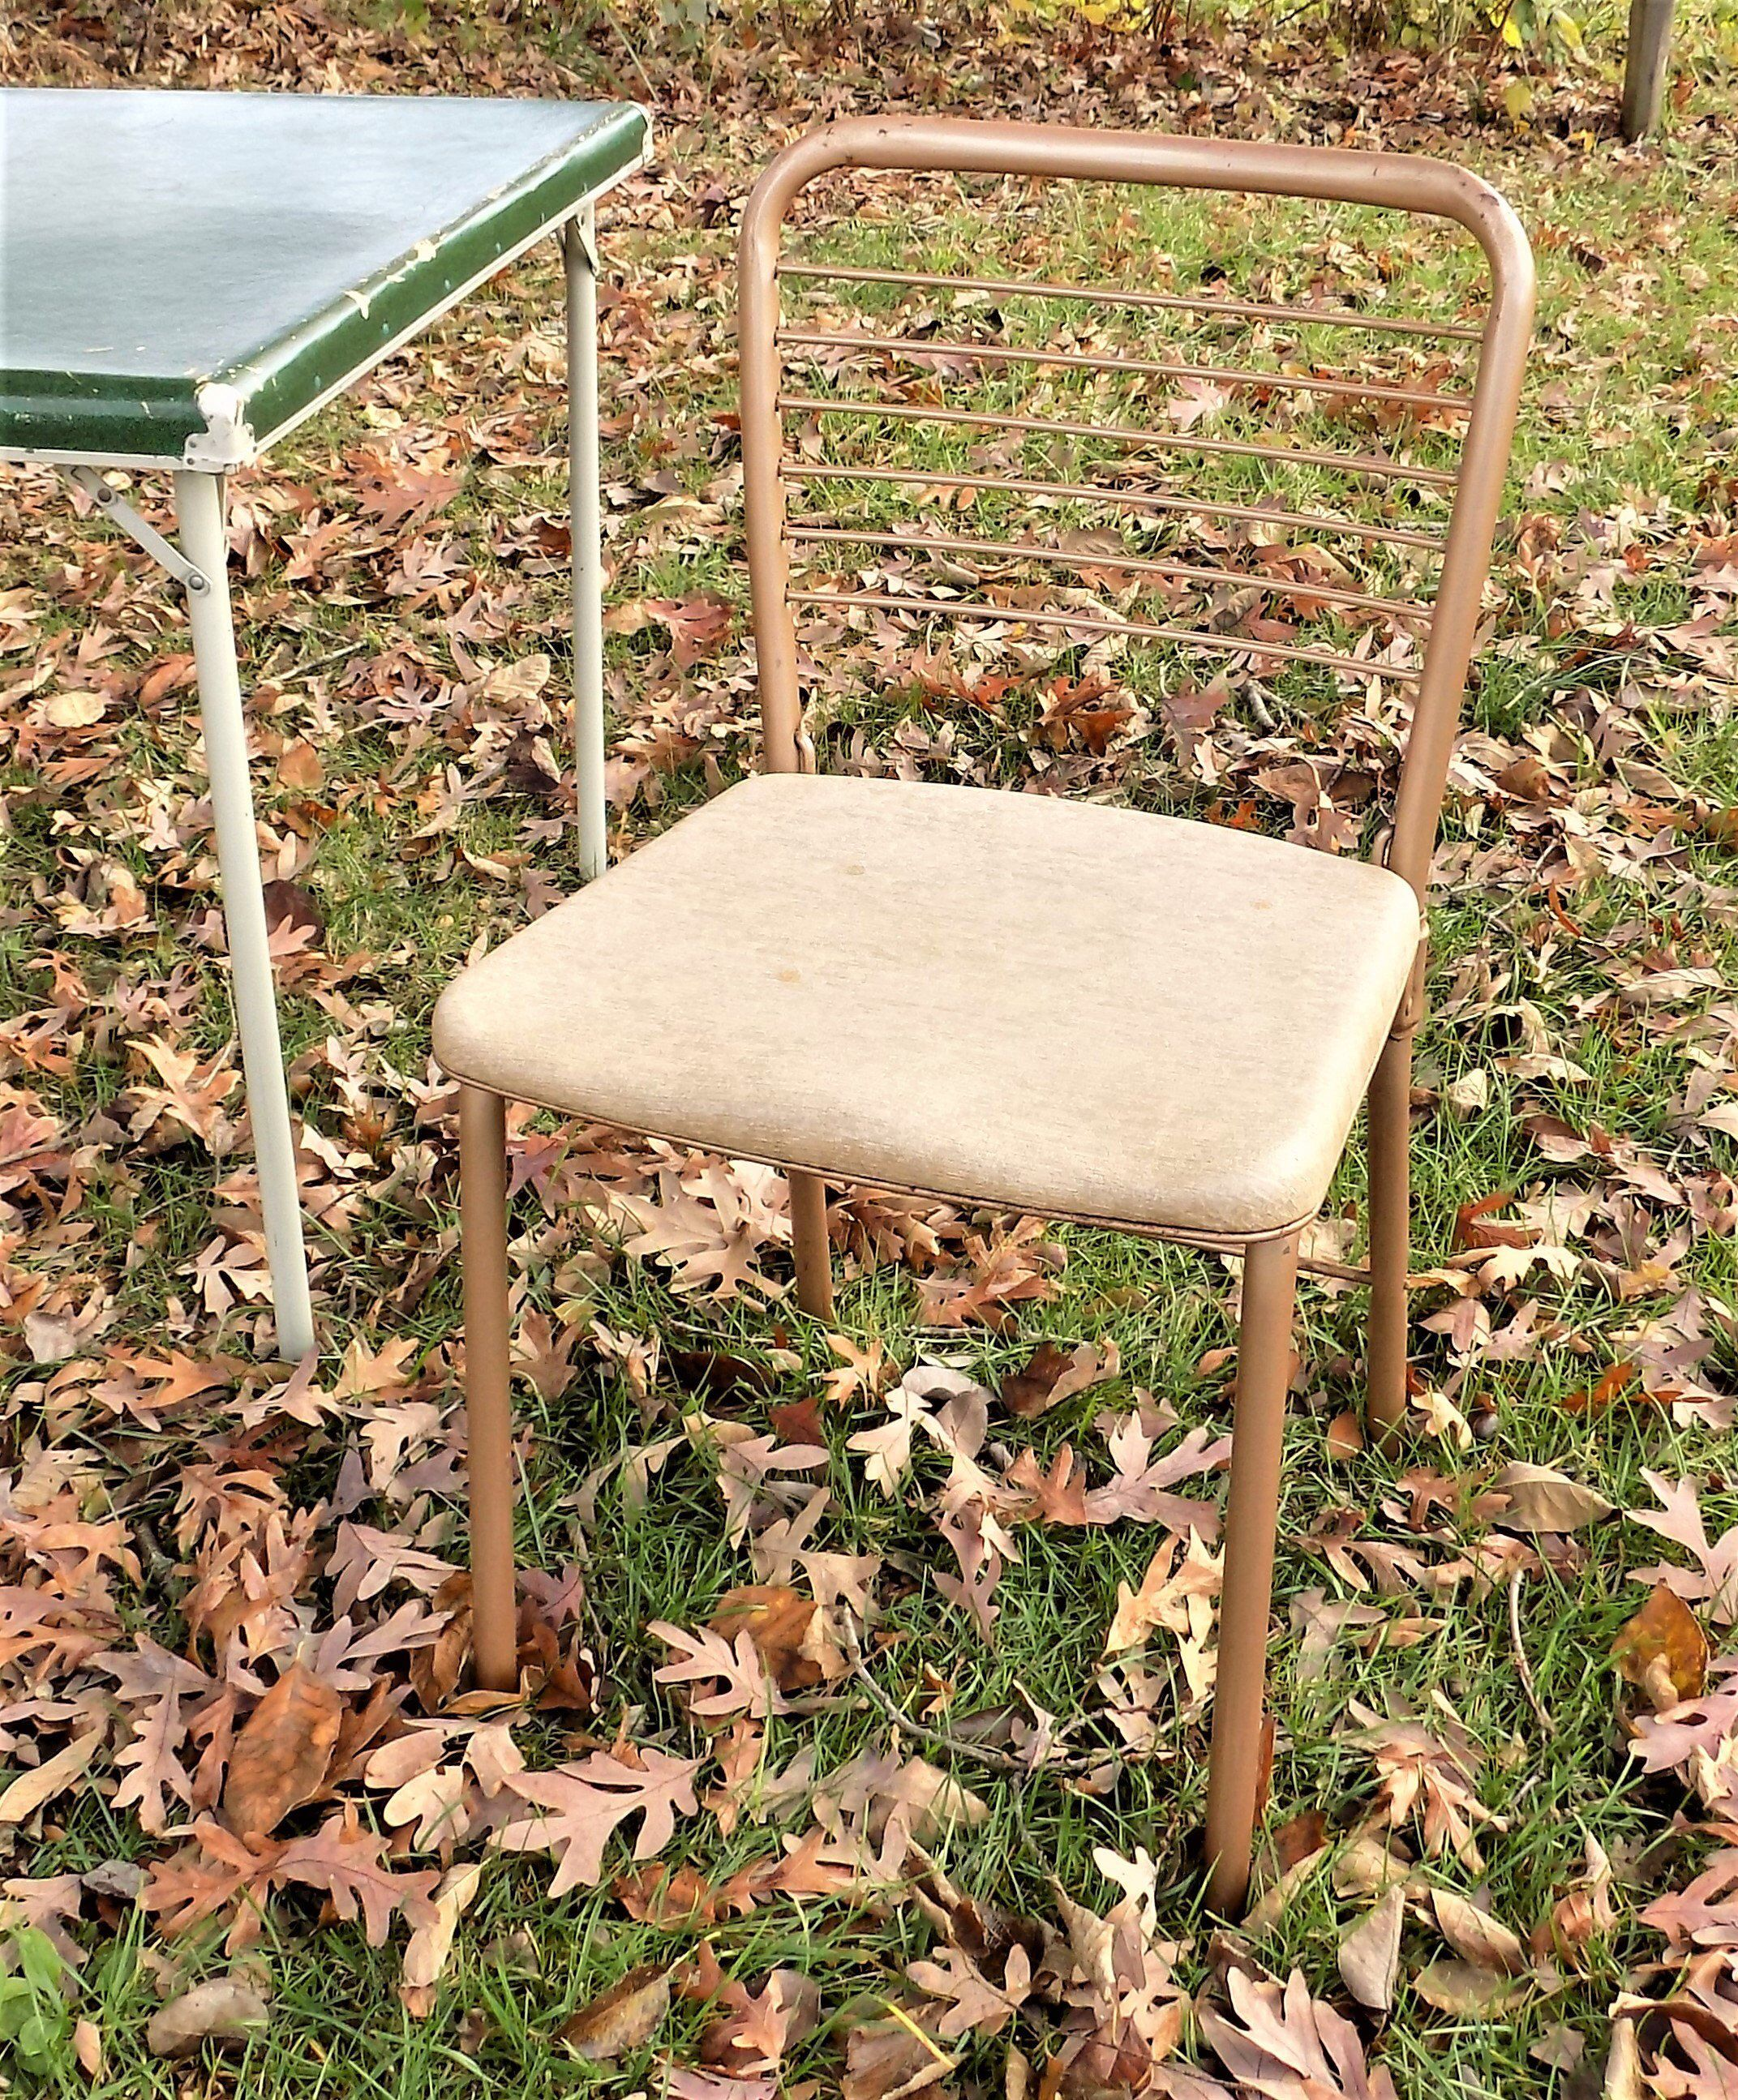 Hamilton cosco gatefold chair tan and gold vintage mid